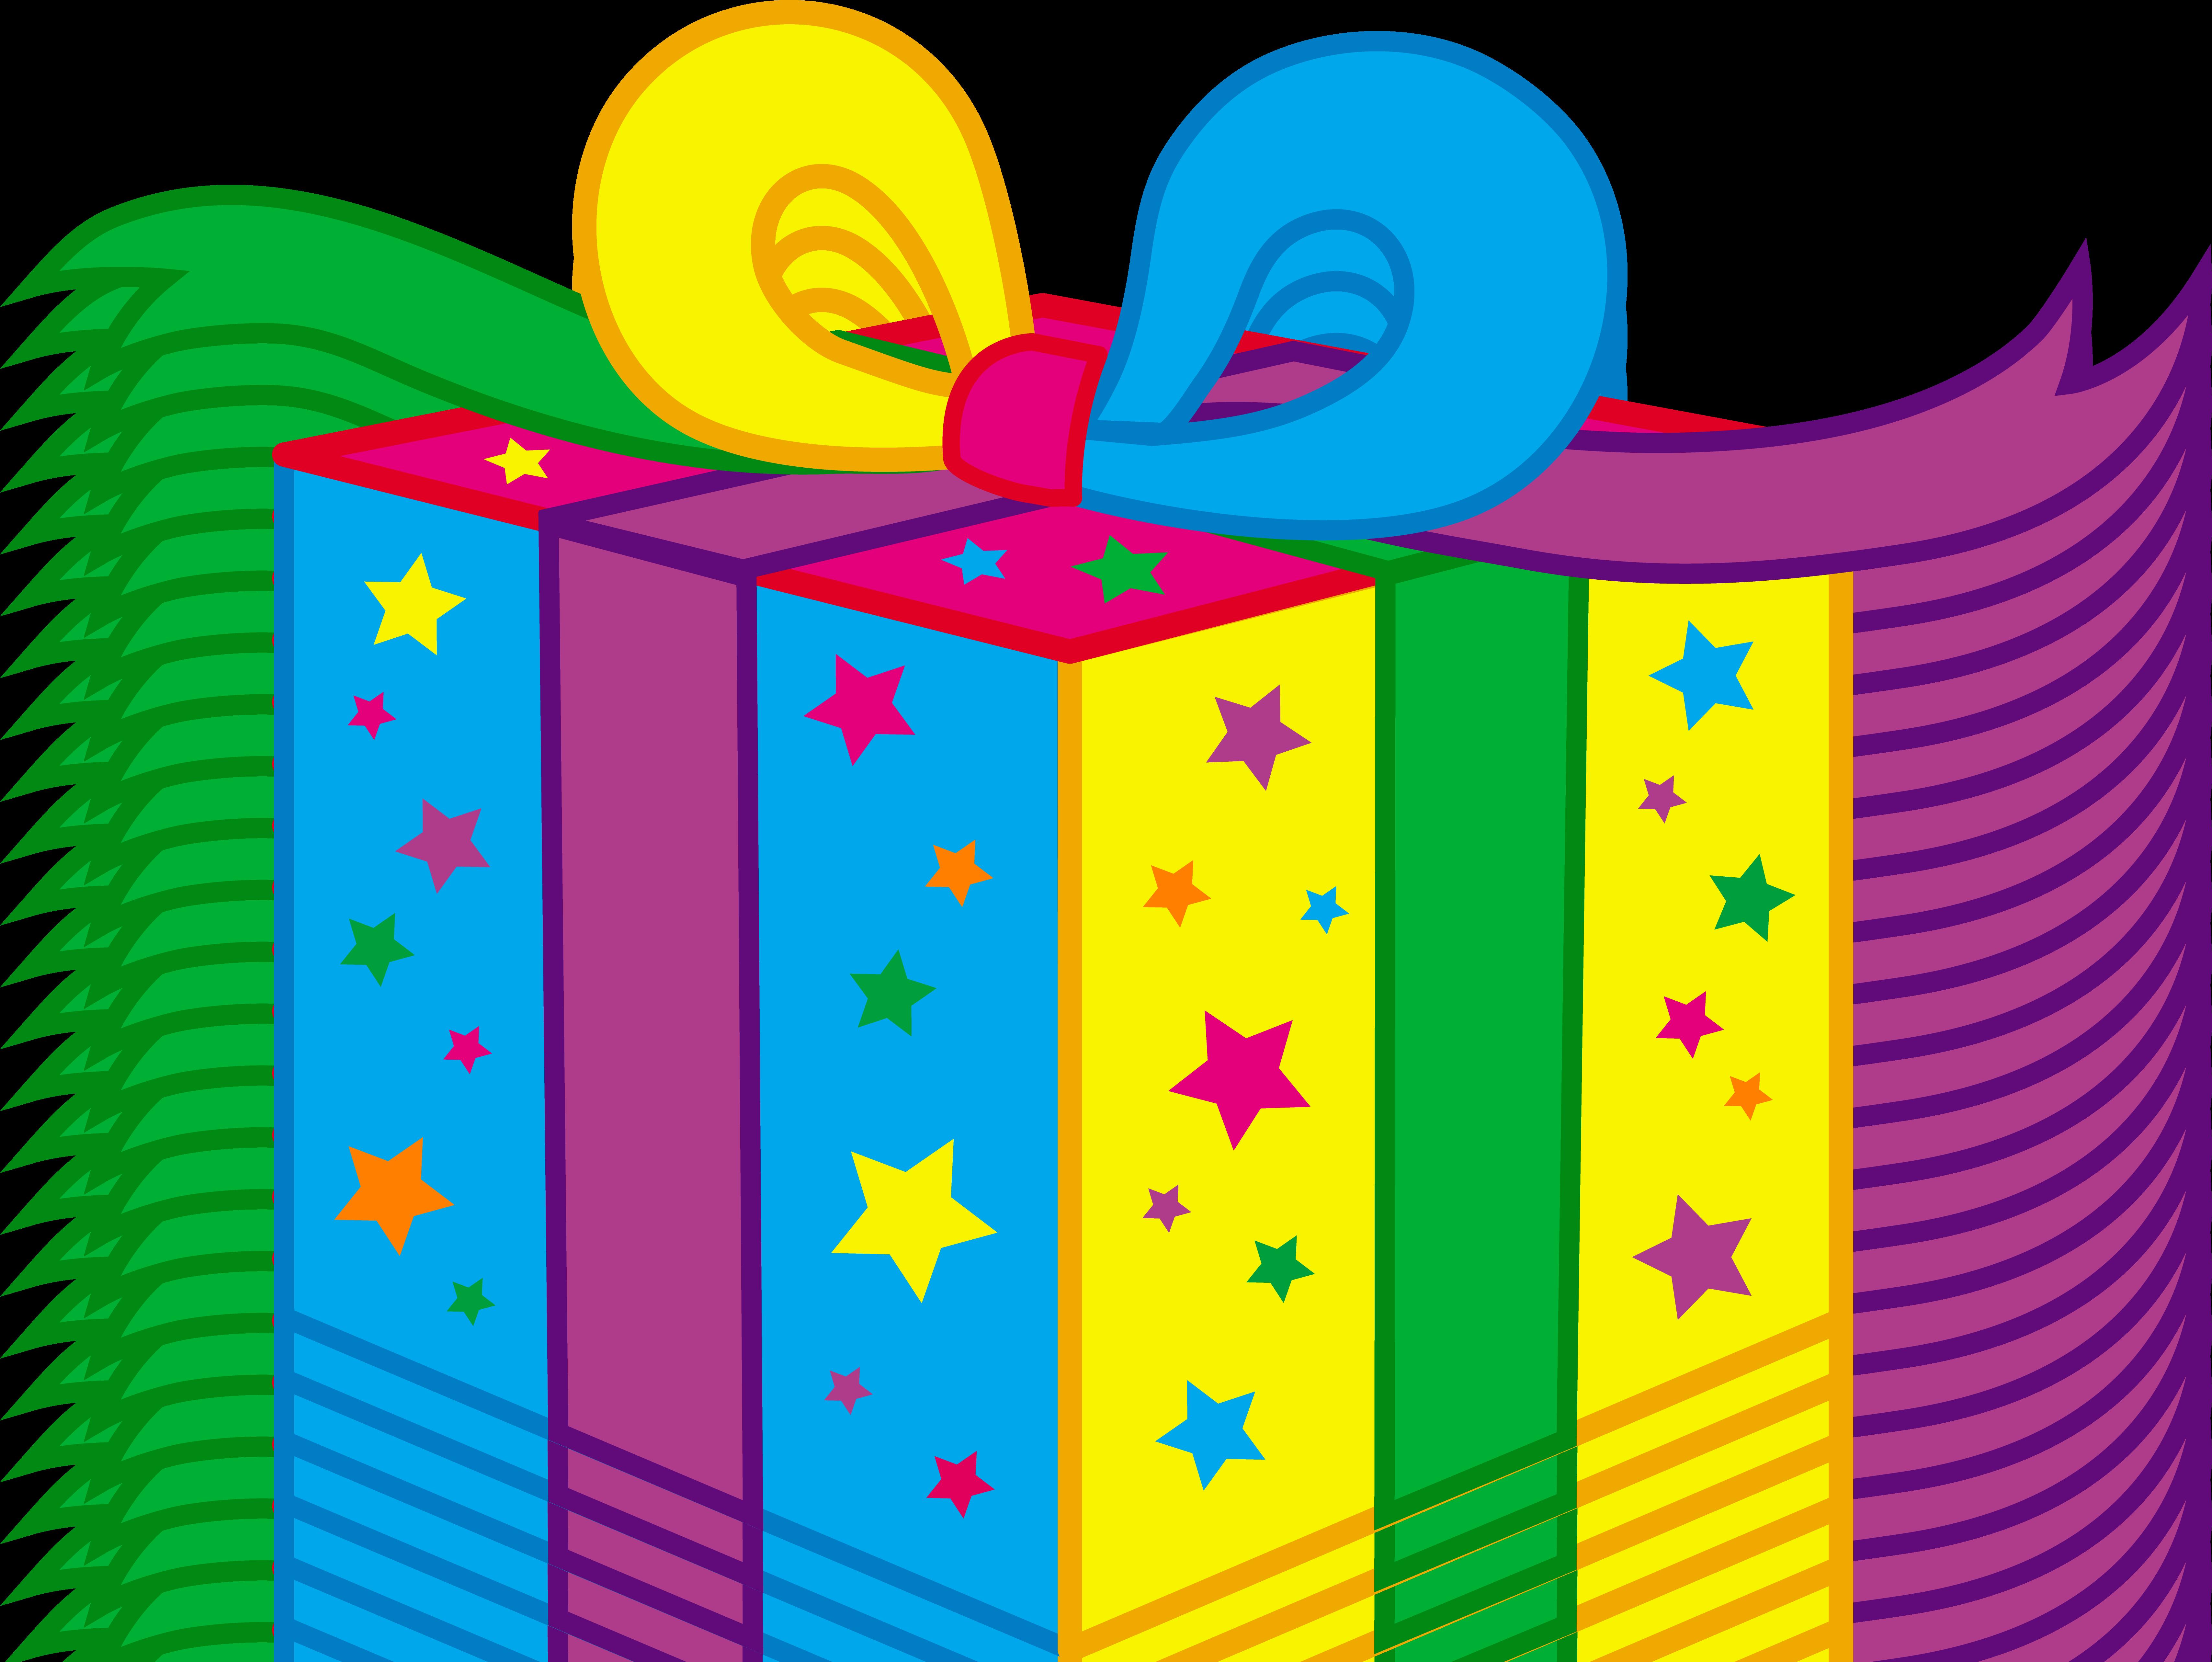 birthday clipart - Birthday Present Clipart